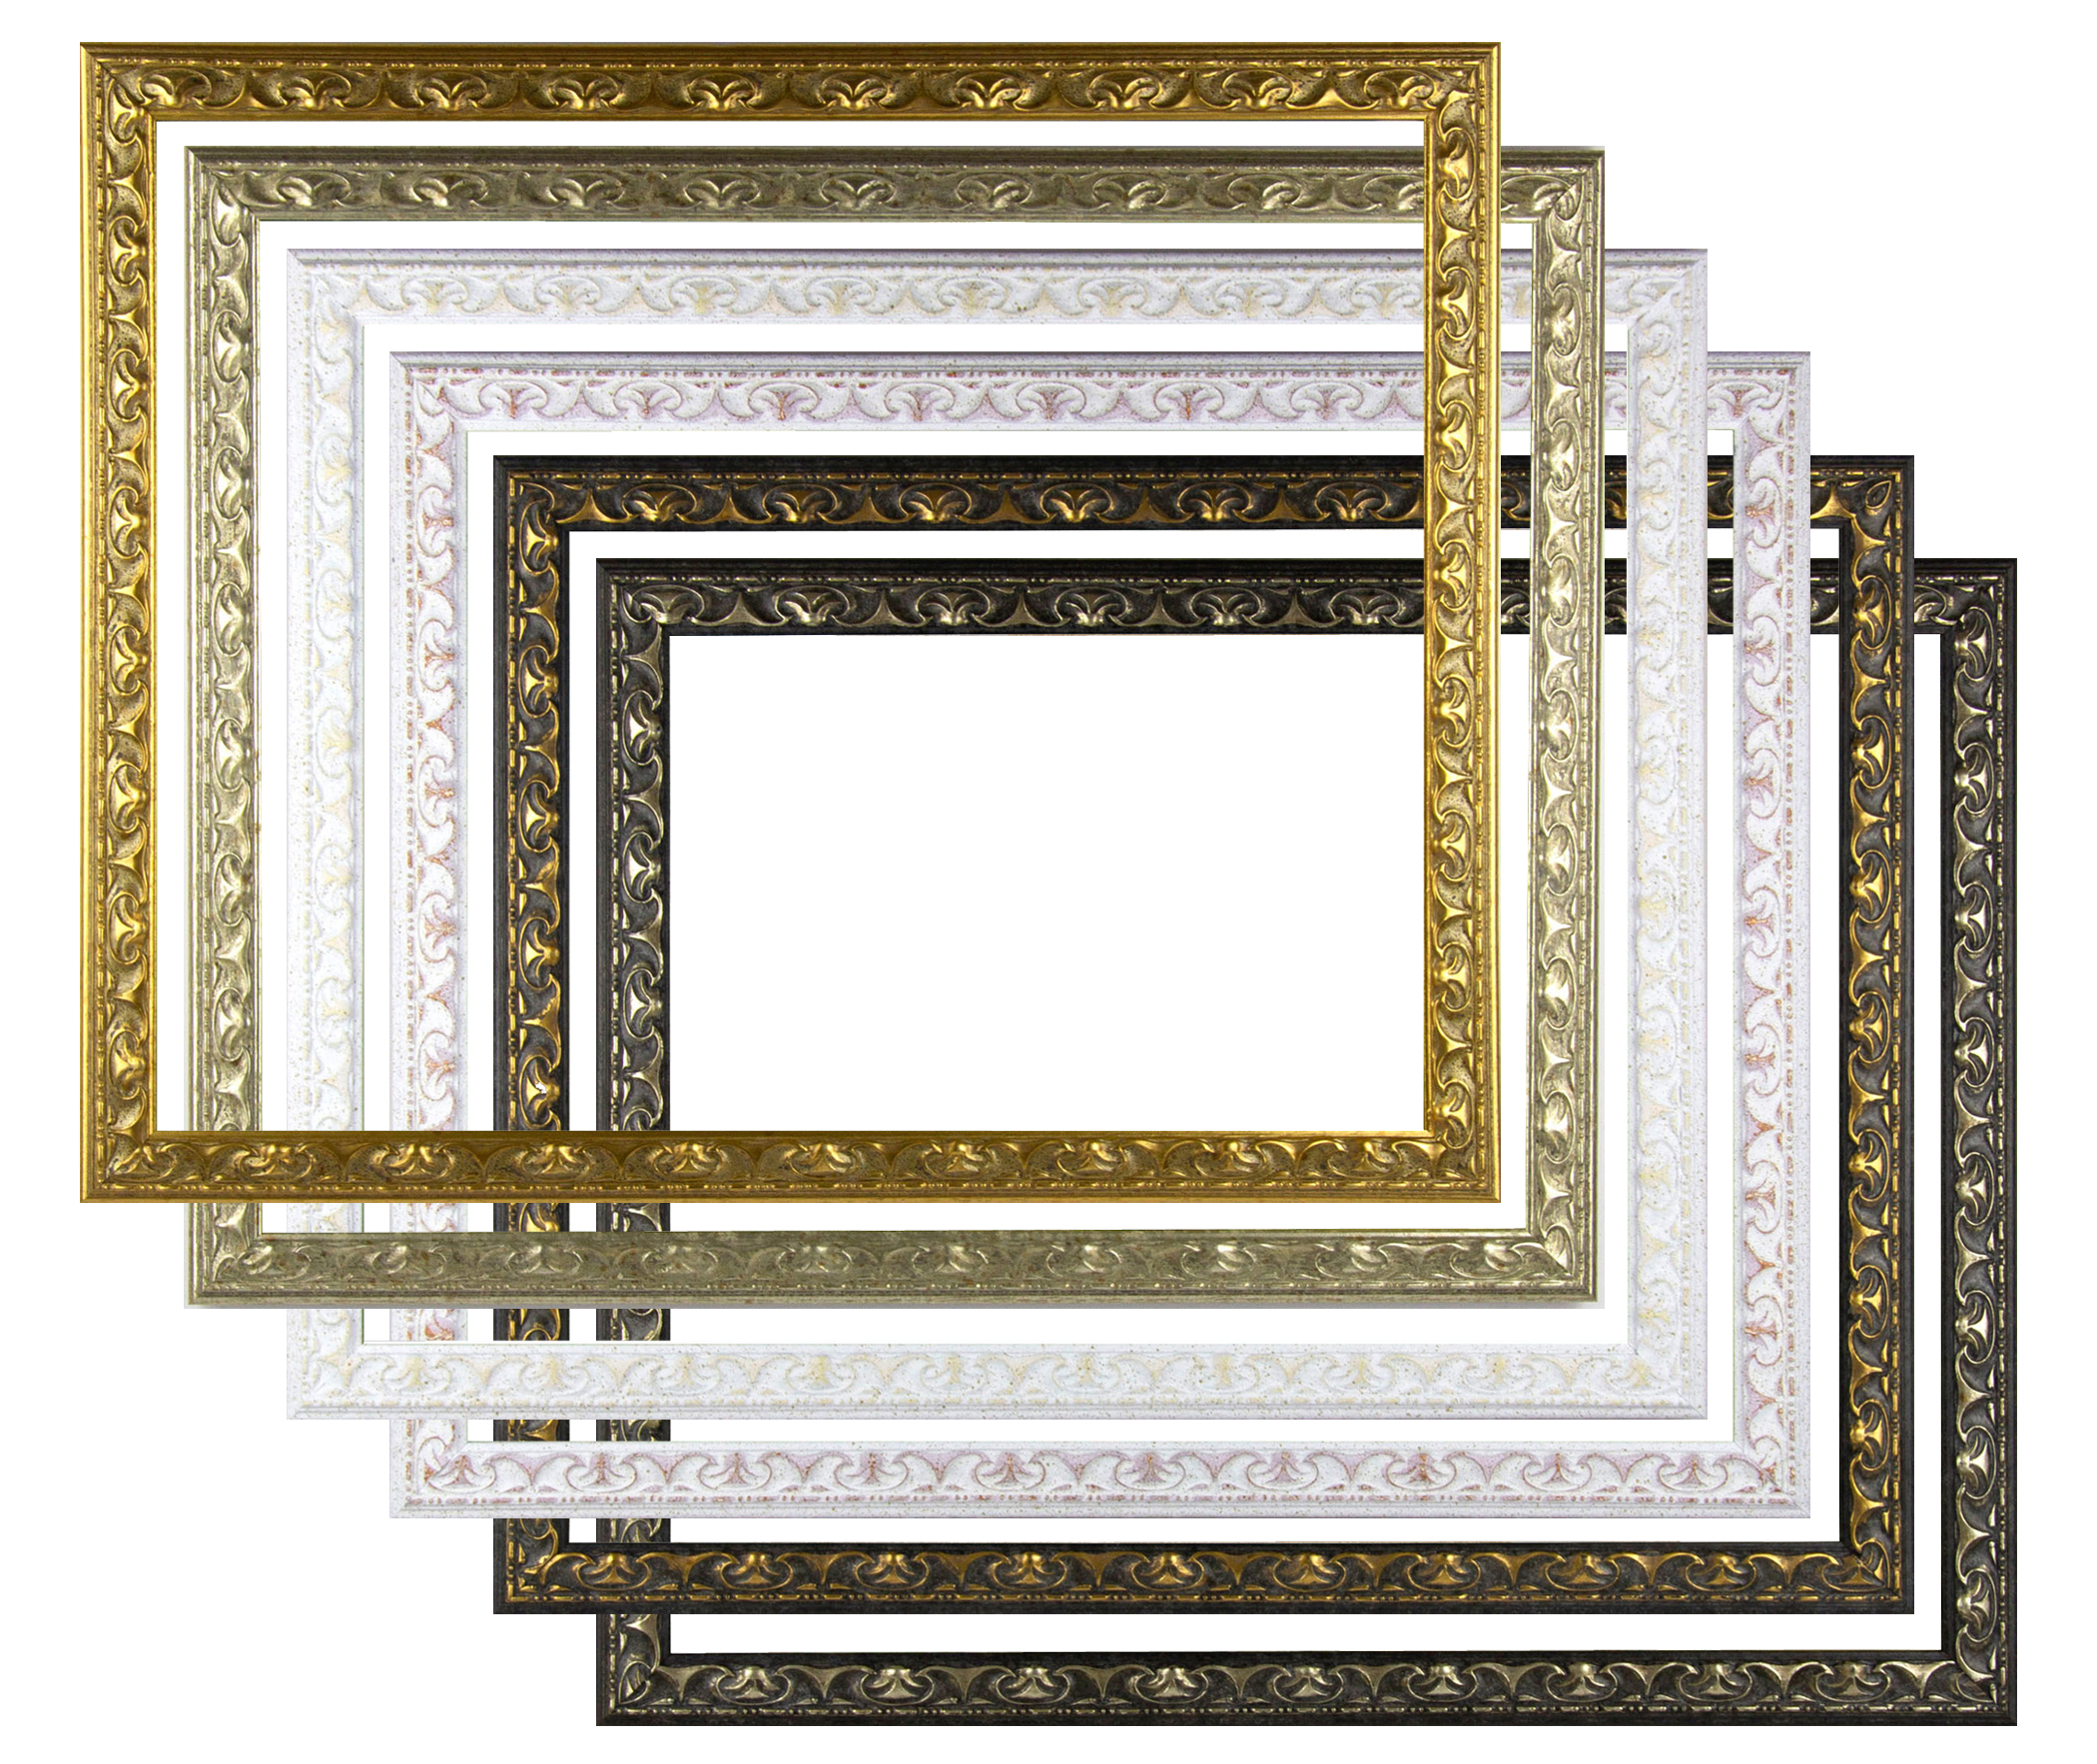 Massivholz Echtholz Bilderrahmen Mandinia 63 x 90 cm. 6 Farben zur Auswahl